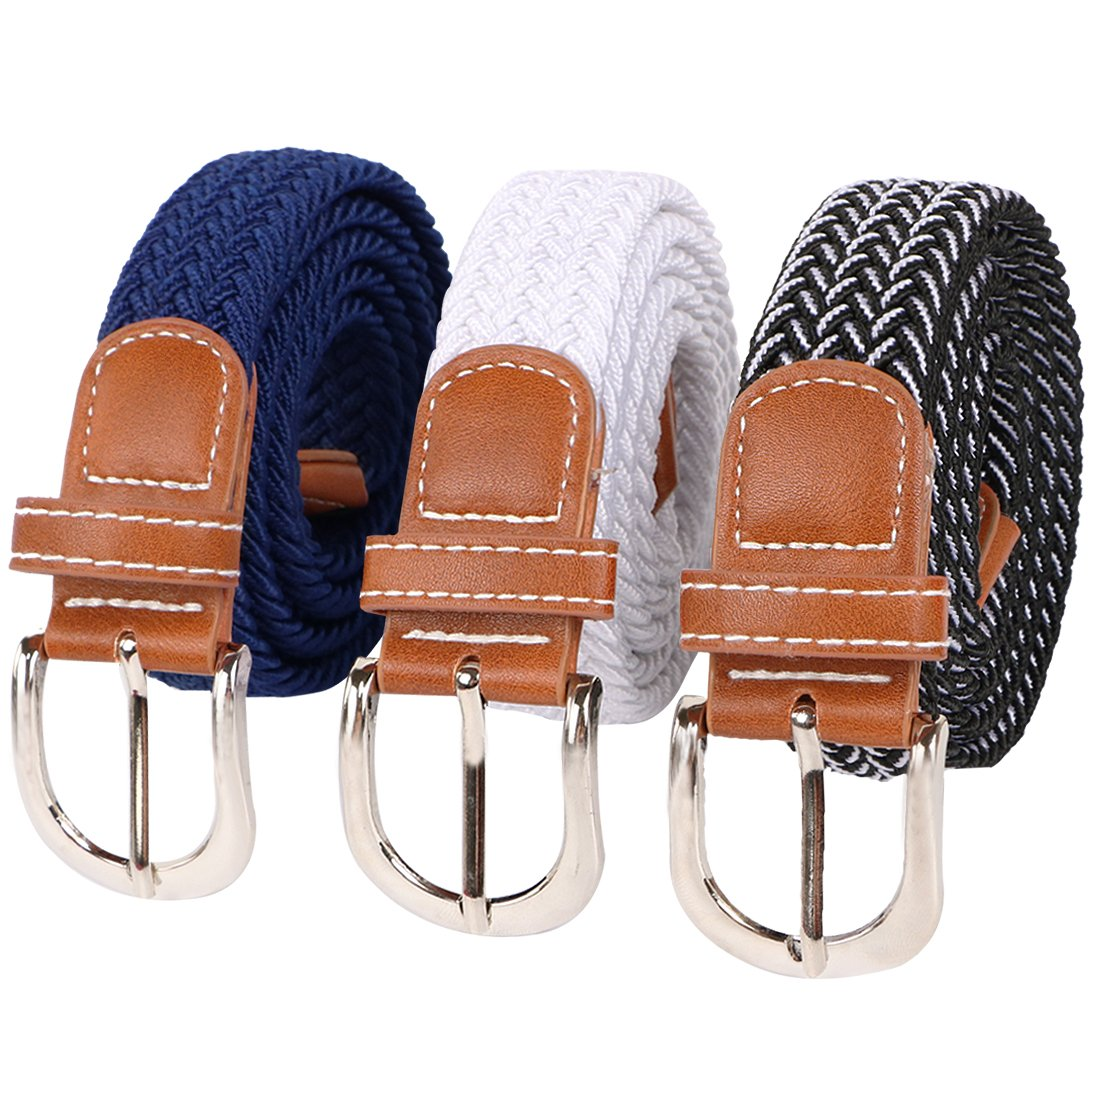 kilofly 3 pcs Kids Boys Girls Stretchy Elastic Web Woven Braided Belts Set BBA601set3L